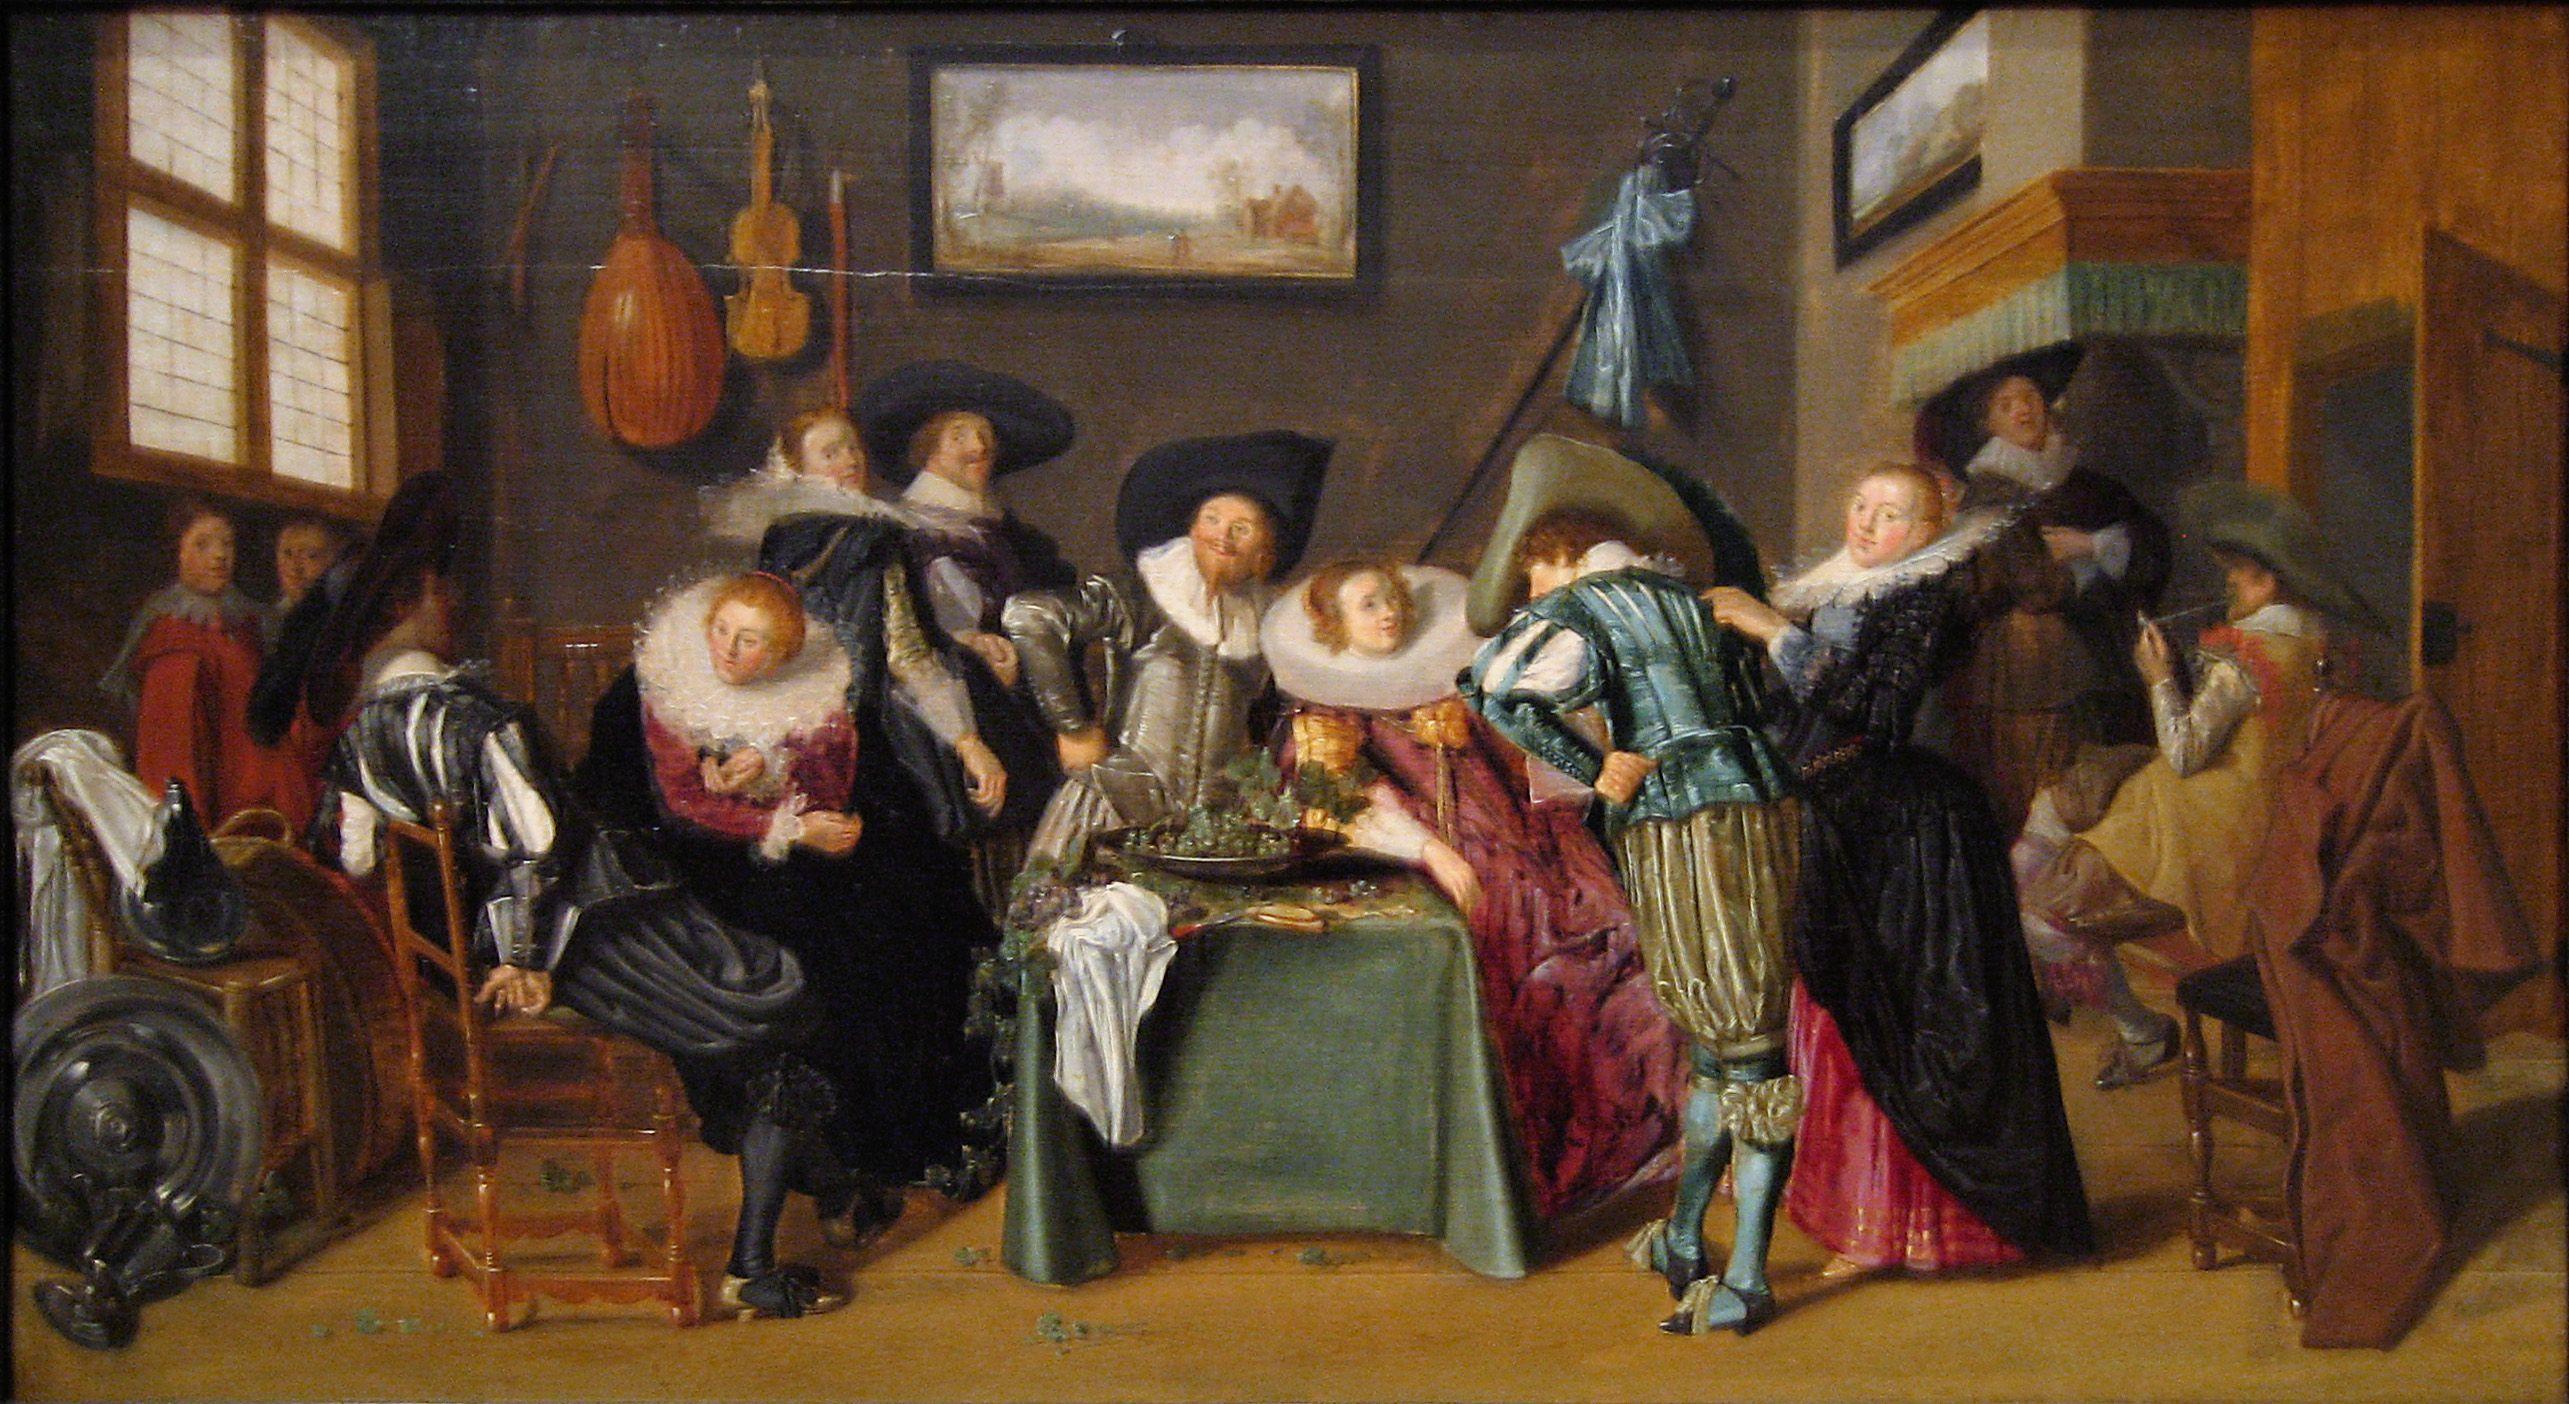 Dirck hals 1591 1656 dutch baroque era for Famous artist in baroque period